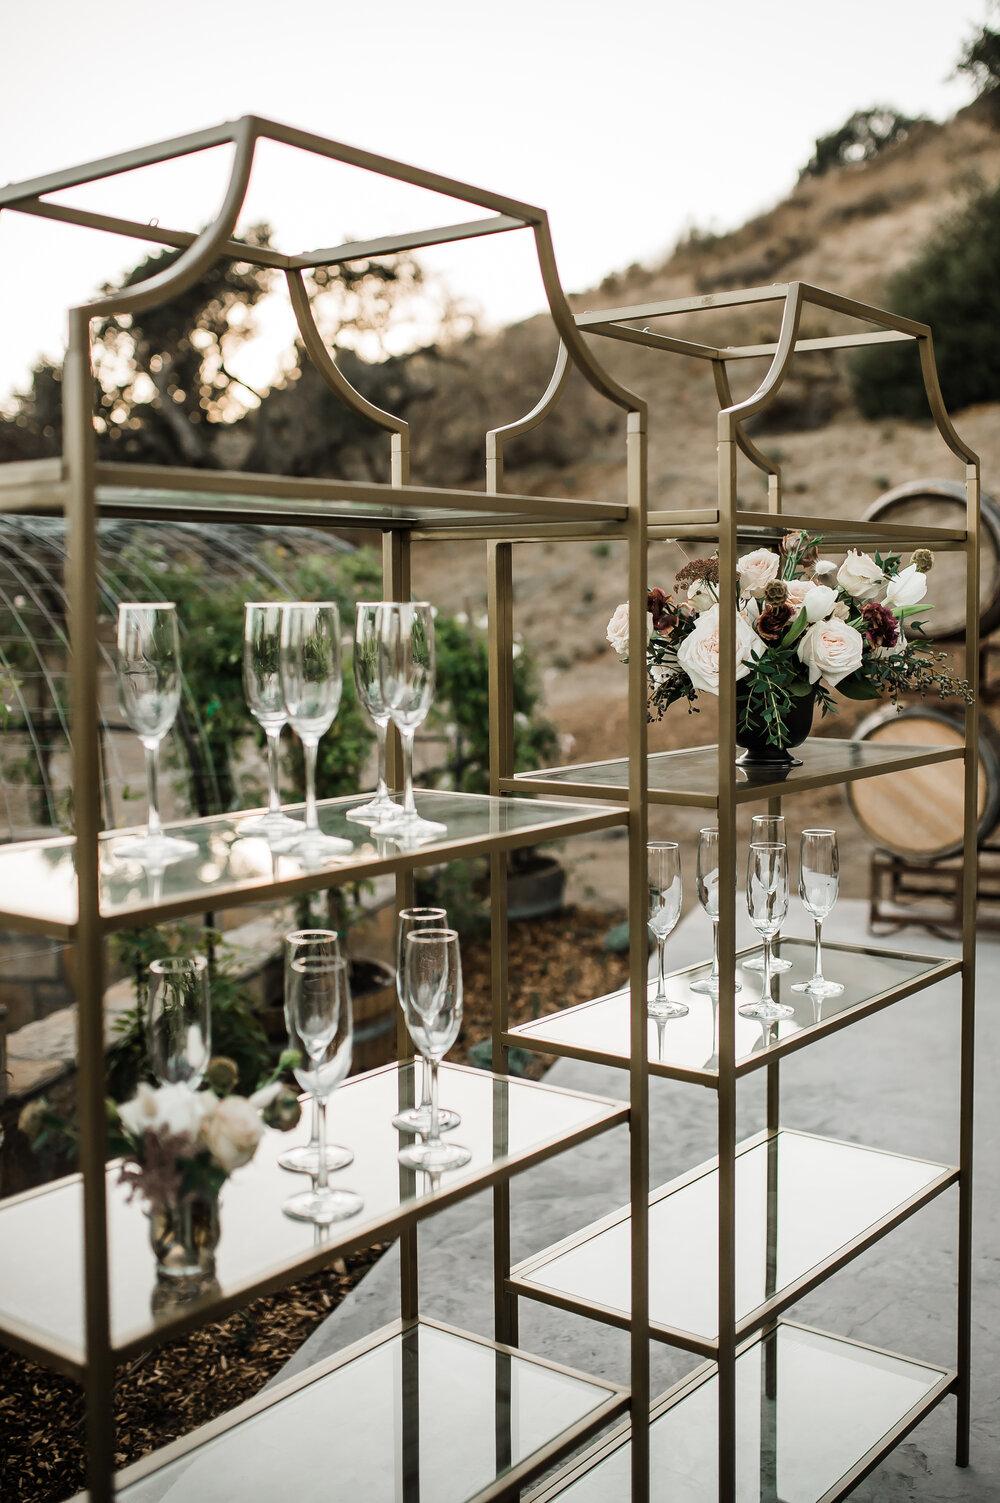 www.santabarbarawedding.com | The Tavern at Zaca Creek | Events by Fran | Michelle Ramirez Photography | Tangled Lotus | Amigo Party Rentals | The Bar Set Up